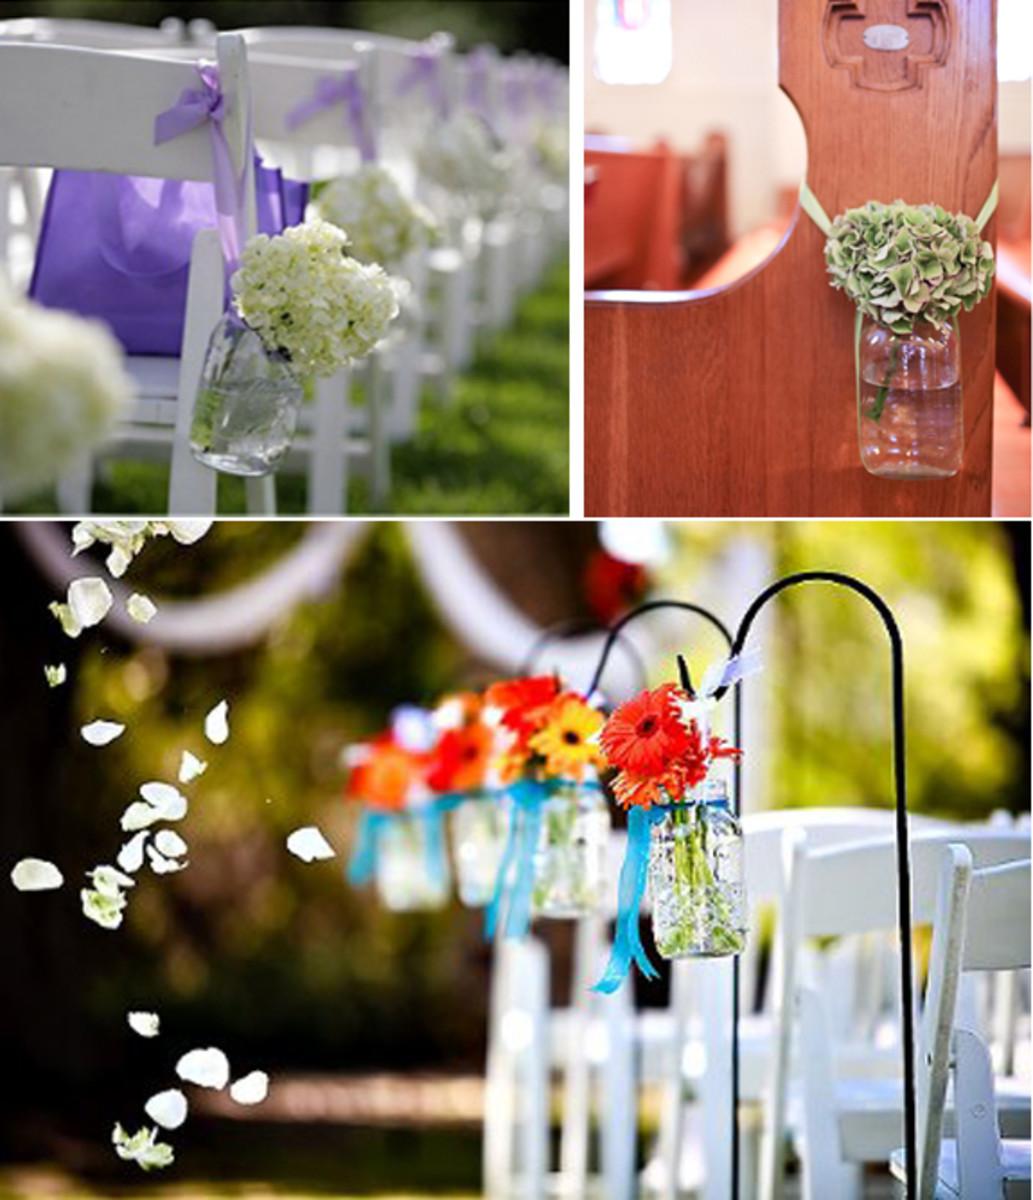 Wedding Decorations Using Mason Jars: Mason Jars For Wedding Decorations: Rustic, Beautiful